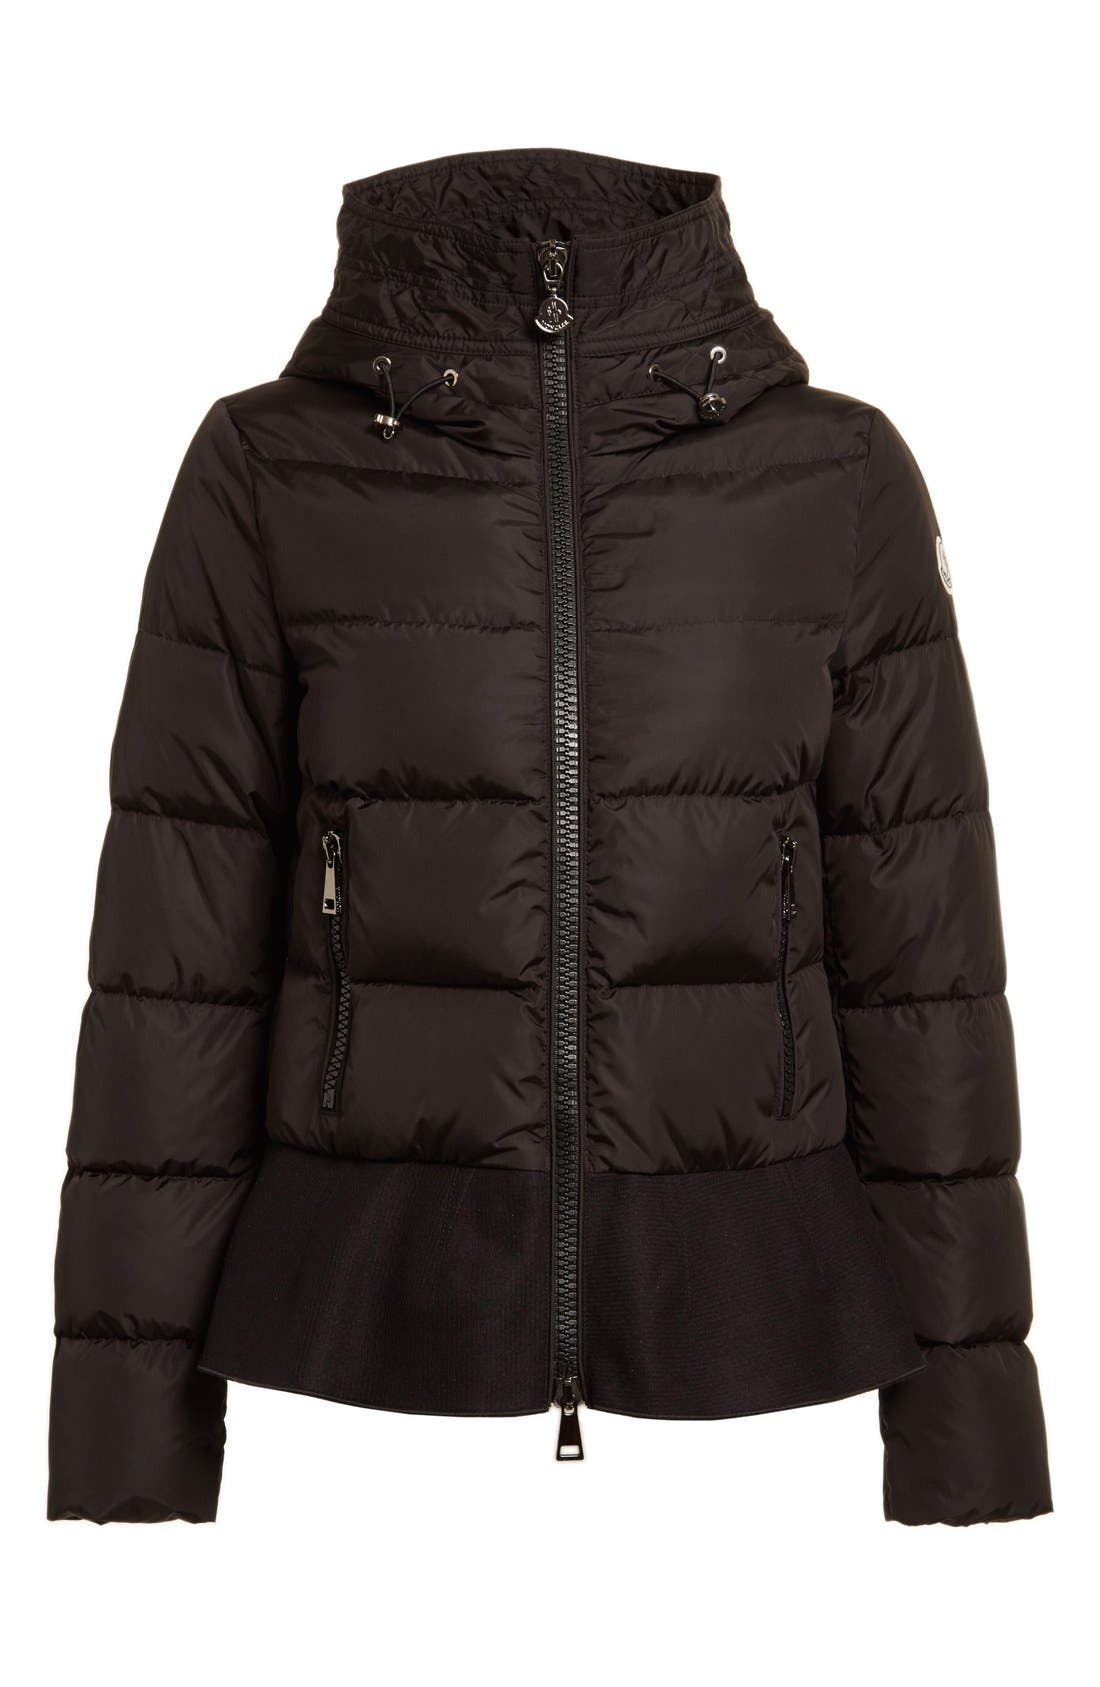 Nesea Peplum Hem Down Puffer Jacket,                             Alternate thumbnail 4, color,                             Black